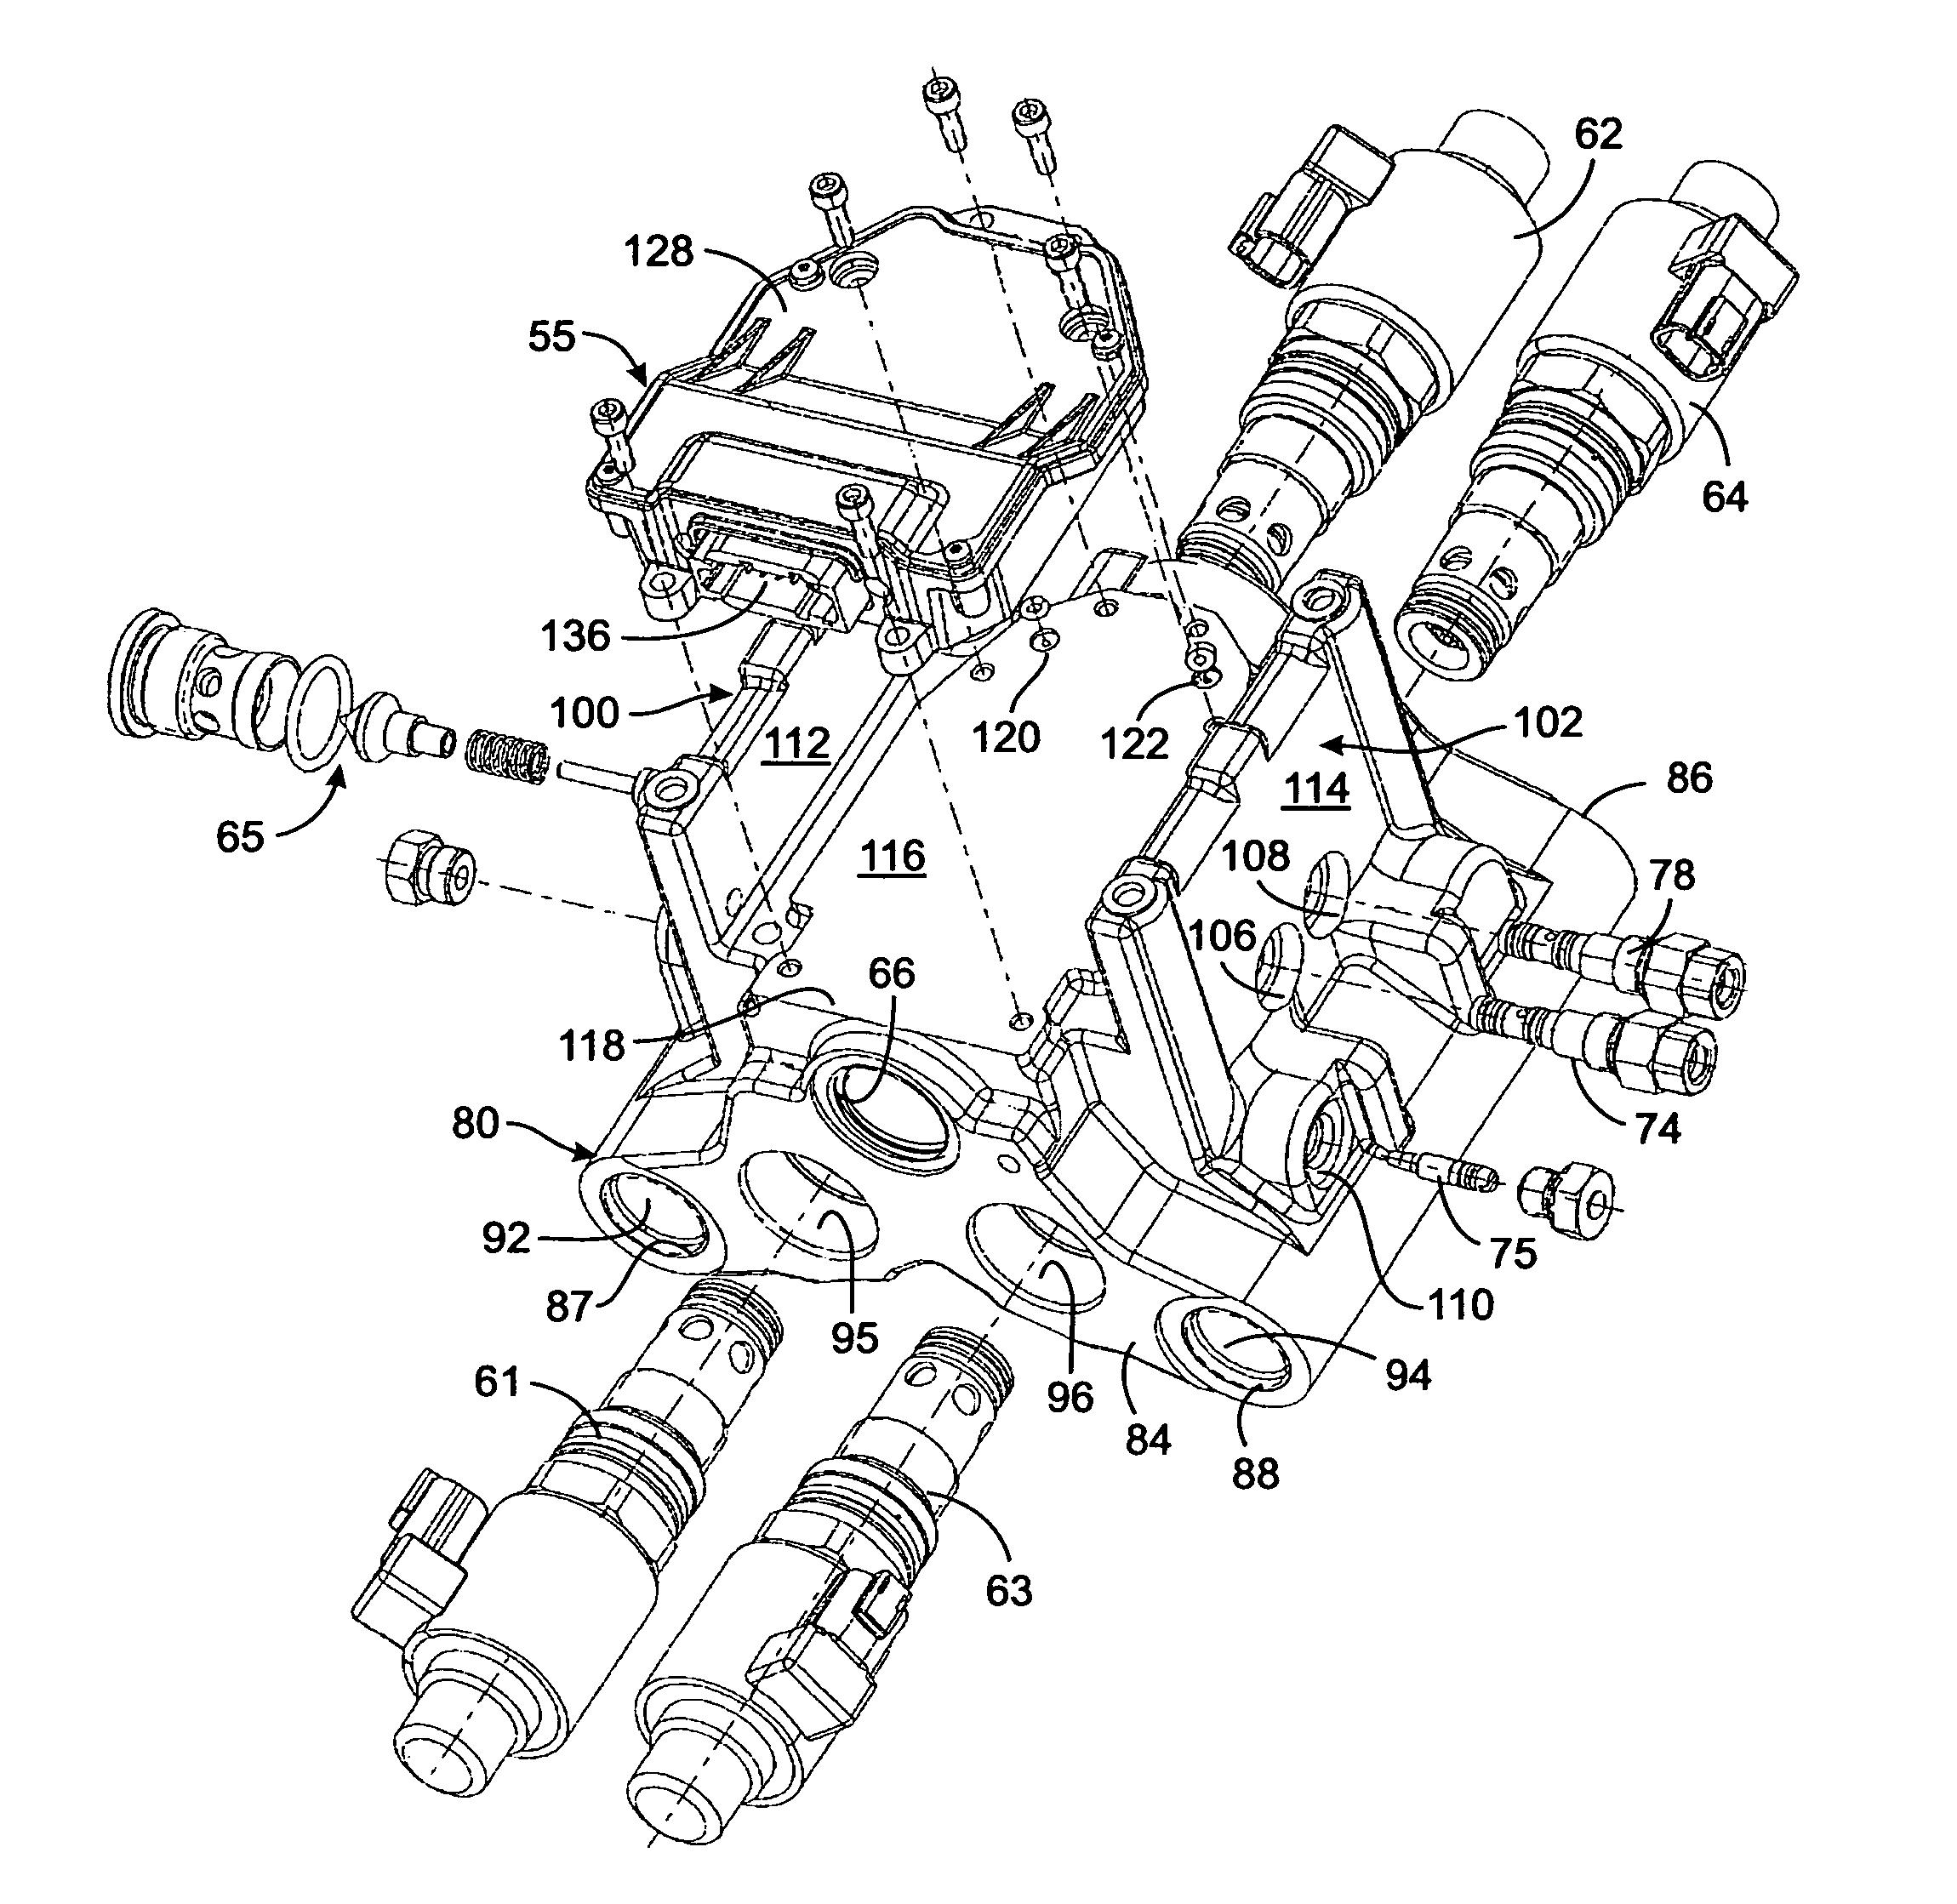 1951 farmall m wiring diagram series battery 140 parts fuse box